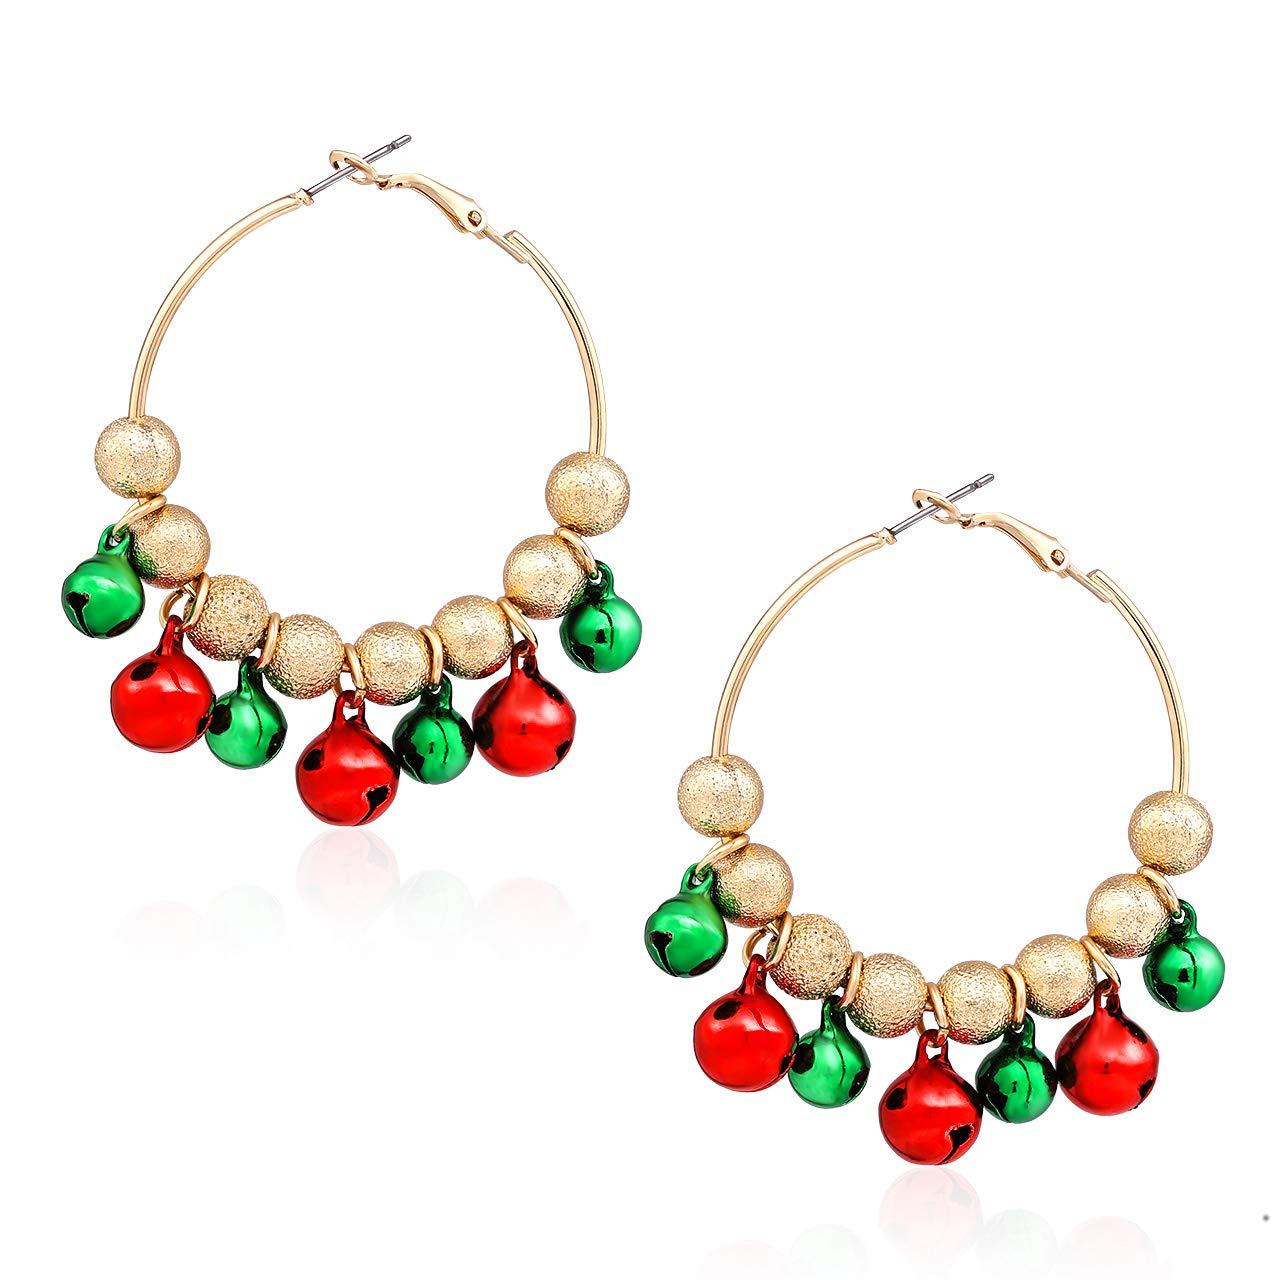 CEALXHENY Christmas Earrings X-Mas Bell Hoop Earrings for Women Holiday Party Dangle Earring Festive Gift for Girls